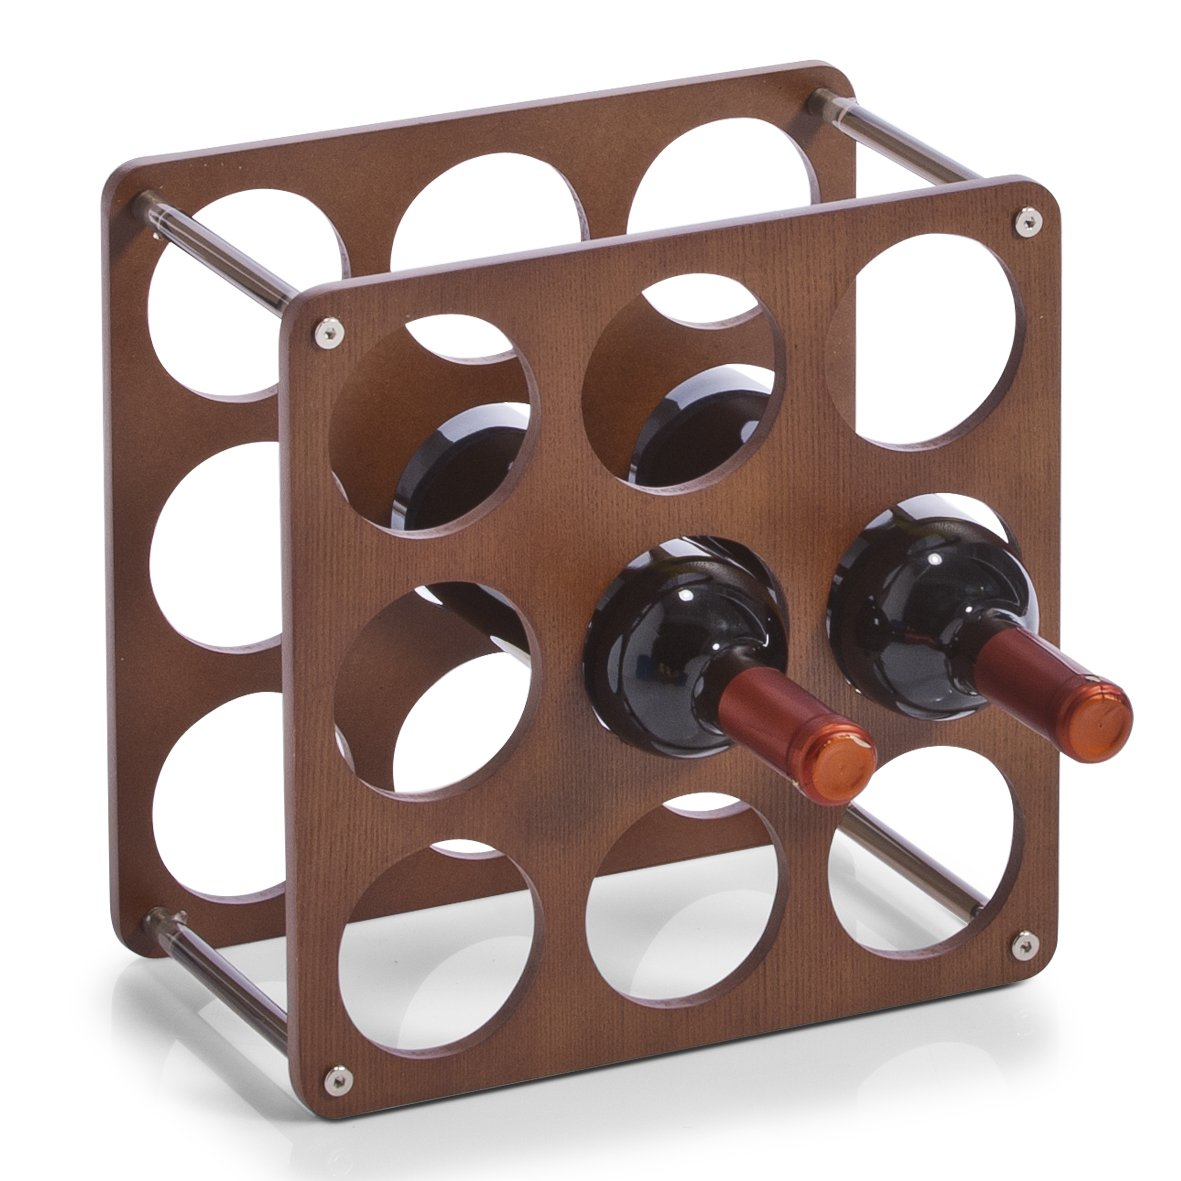 Zeller 13167 Wine Rack for 9 Bottles 0.7 Litres Includes 4 Plastic Connecting Parts 30 x 30 x 17 cm   B00CFICFOY